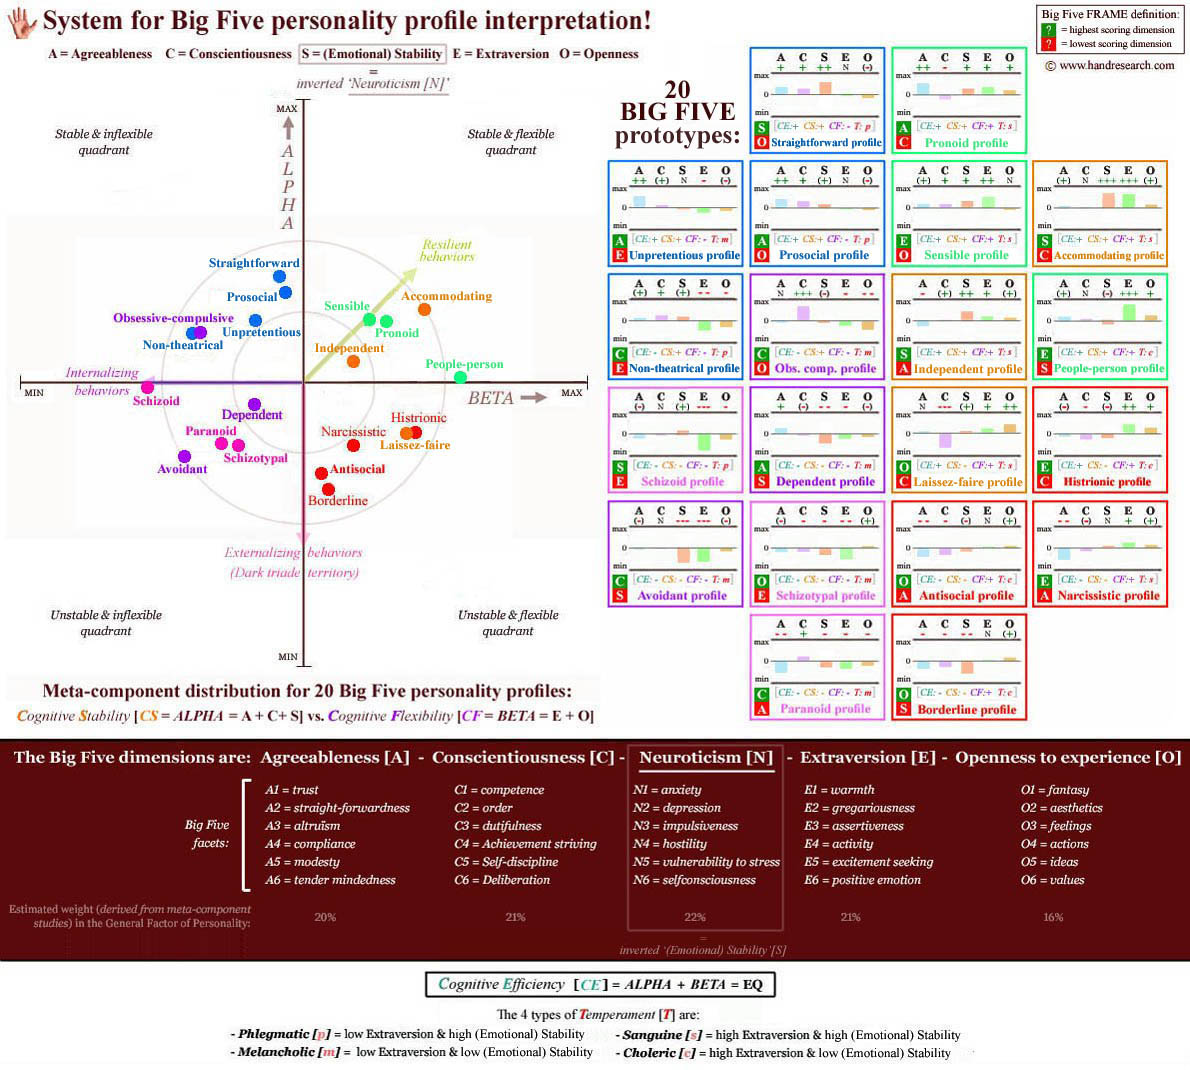 System for Big Five personality profile interpretation